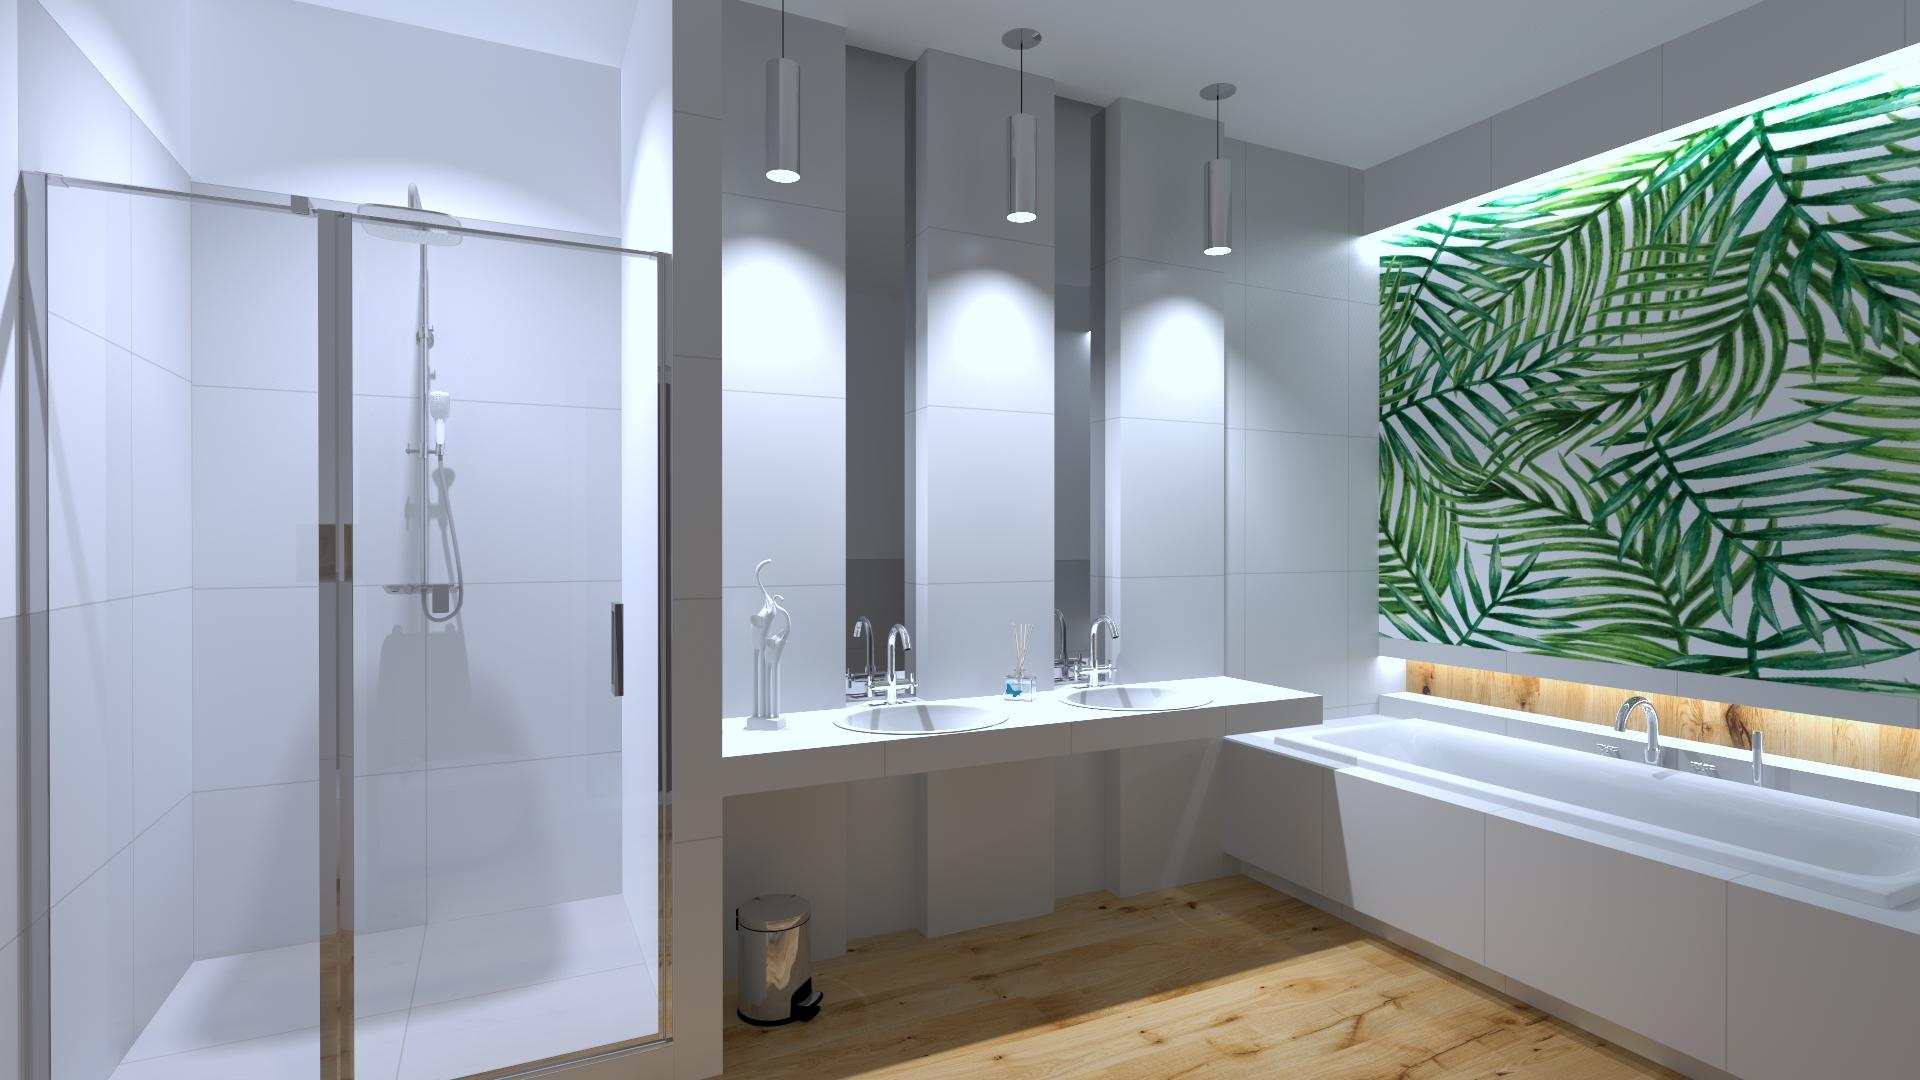 cad-decor-example- (12)